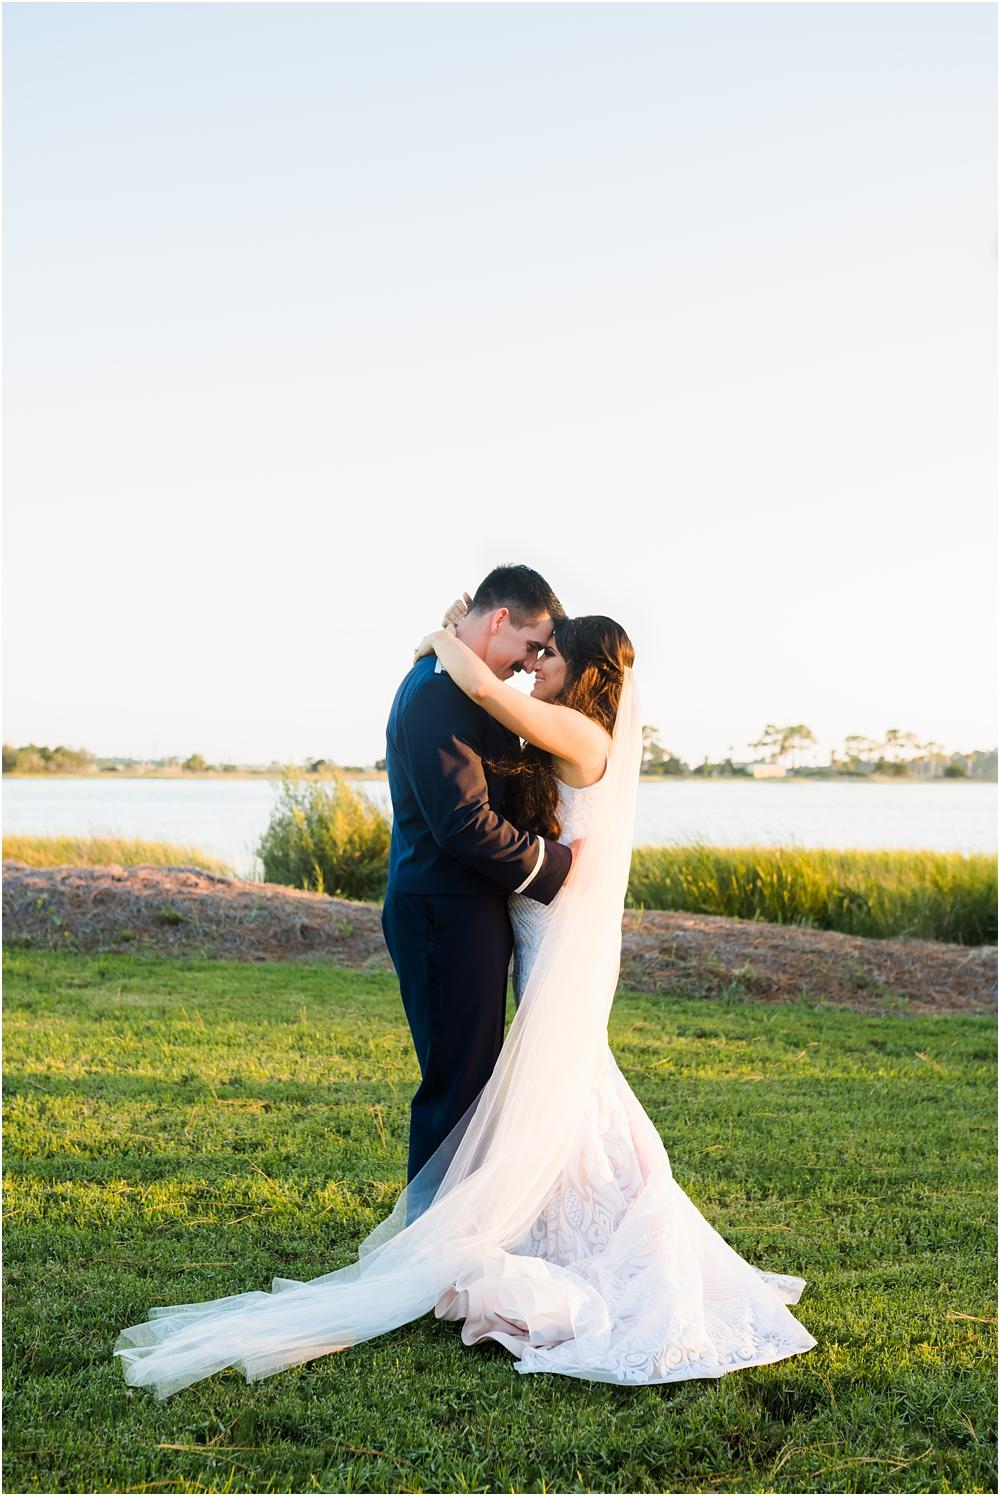 amack-wedding-kiersten-stevenson-photography-30a-panama-city-beach-dothan-tallahassee-(527-of-882).JPG